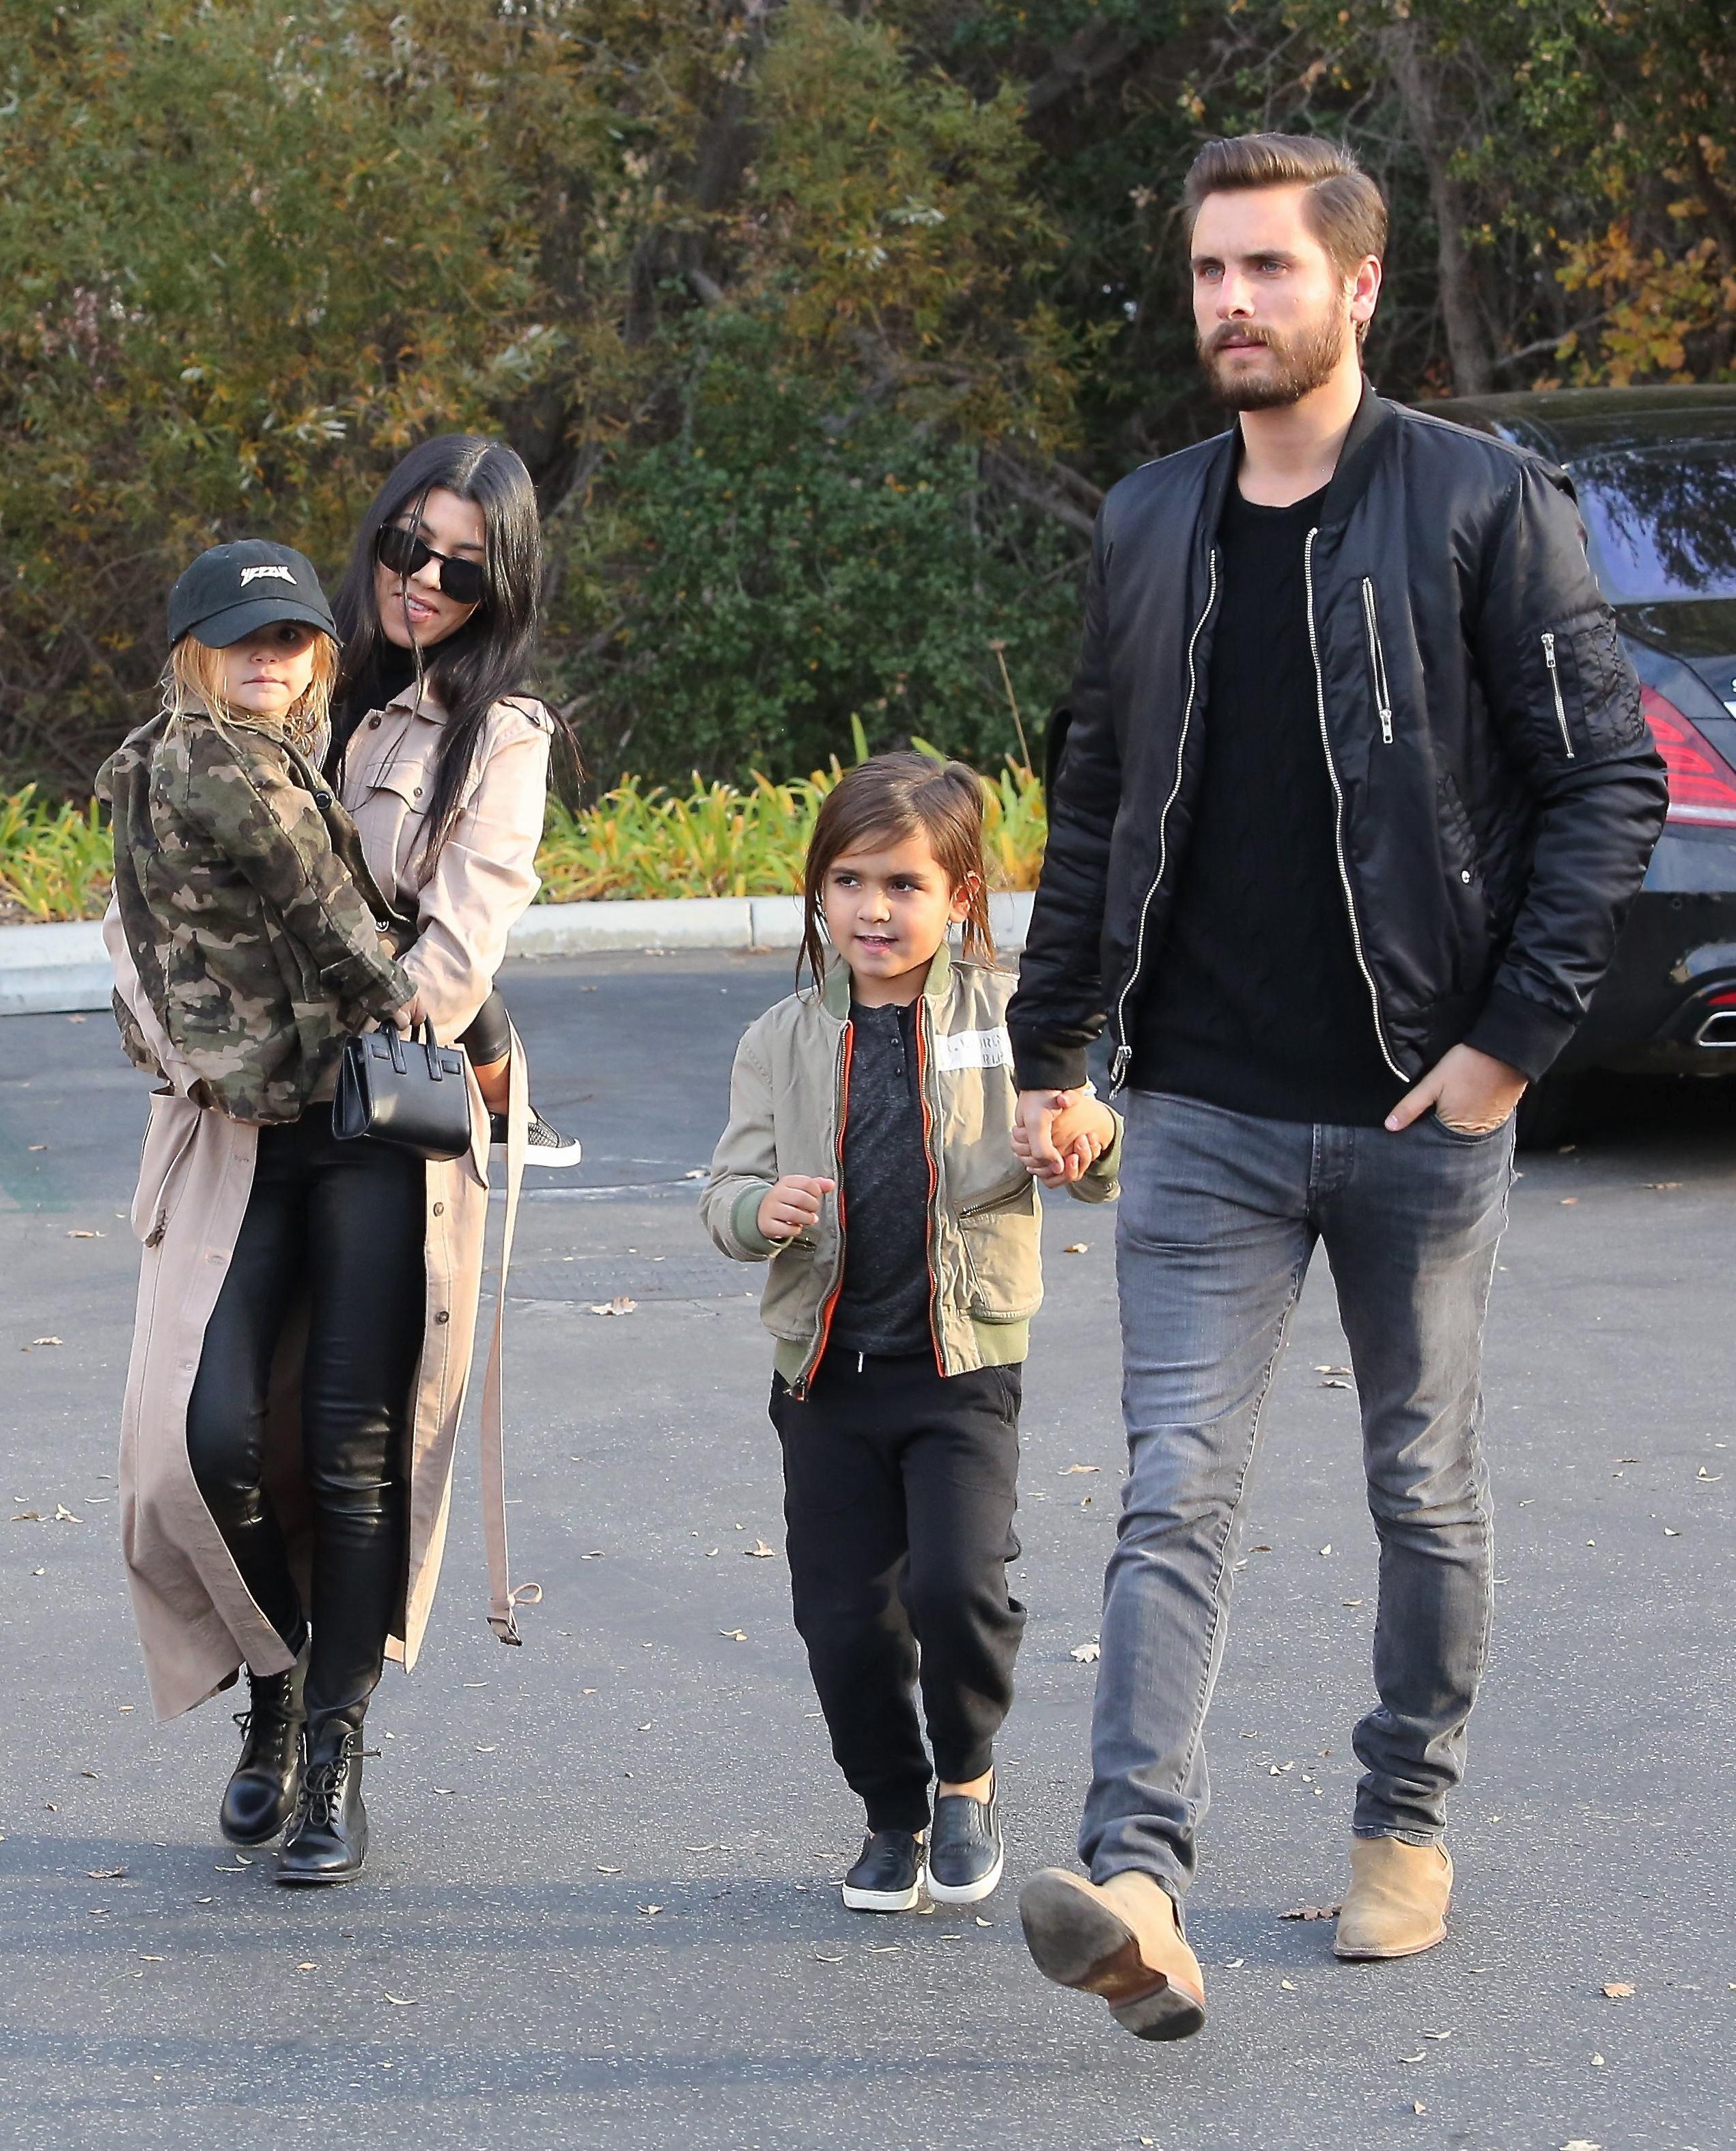 Amar A Muerte Capitulo 29: Kourtney Kardashian Y Scott Disick Vuelven A Reunirse